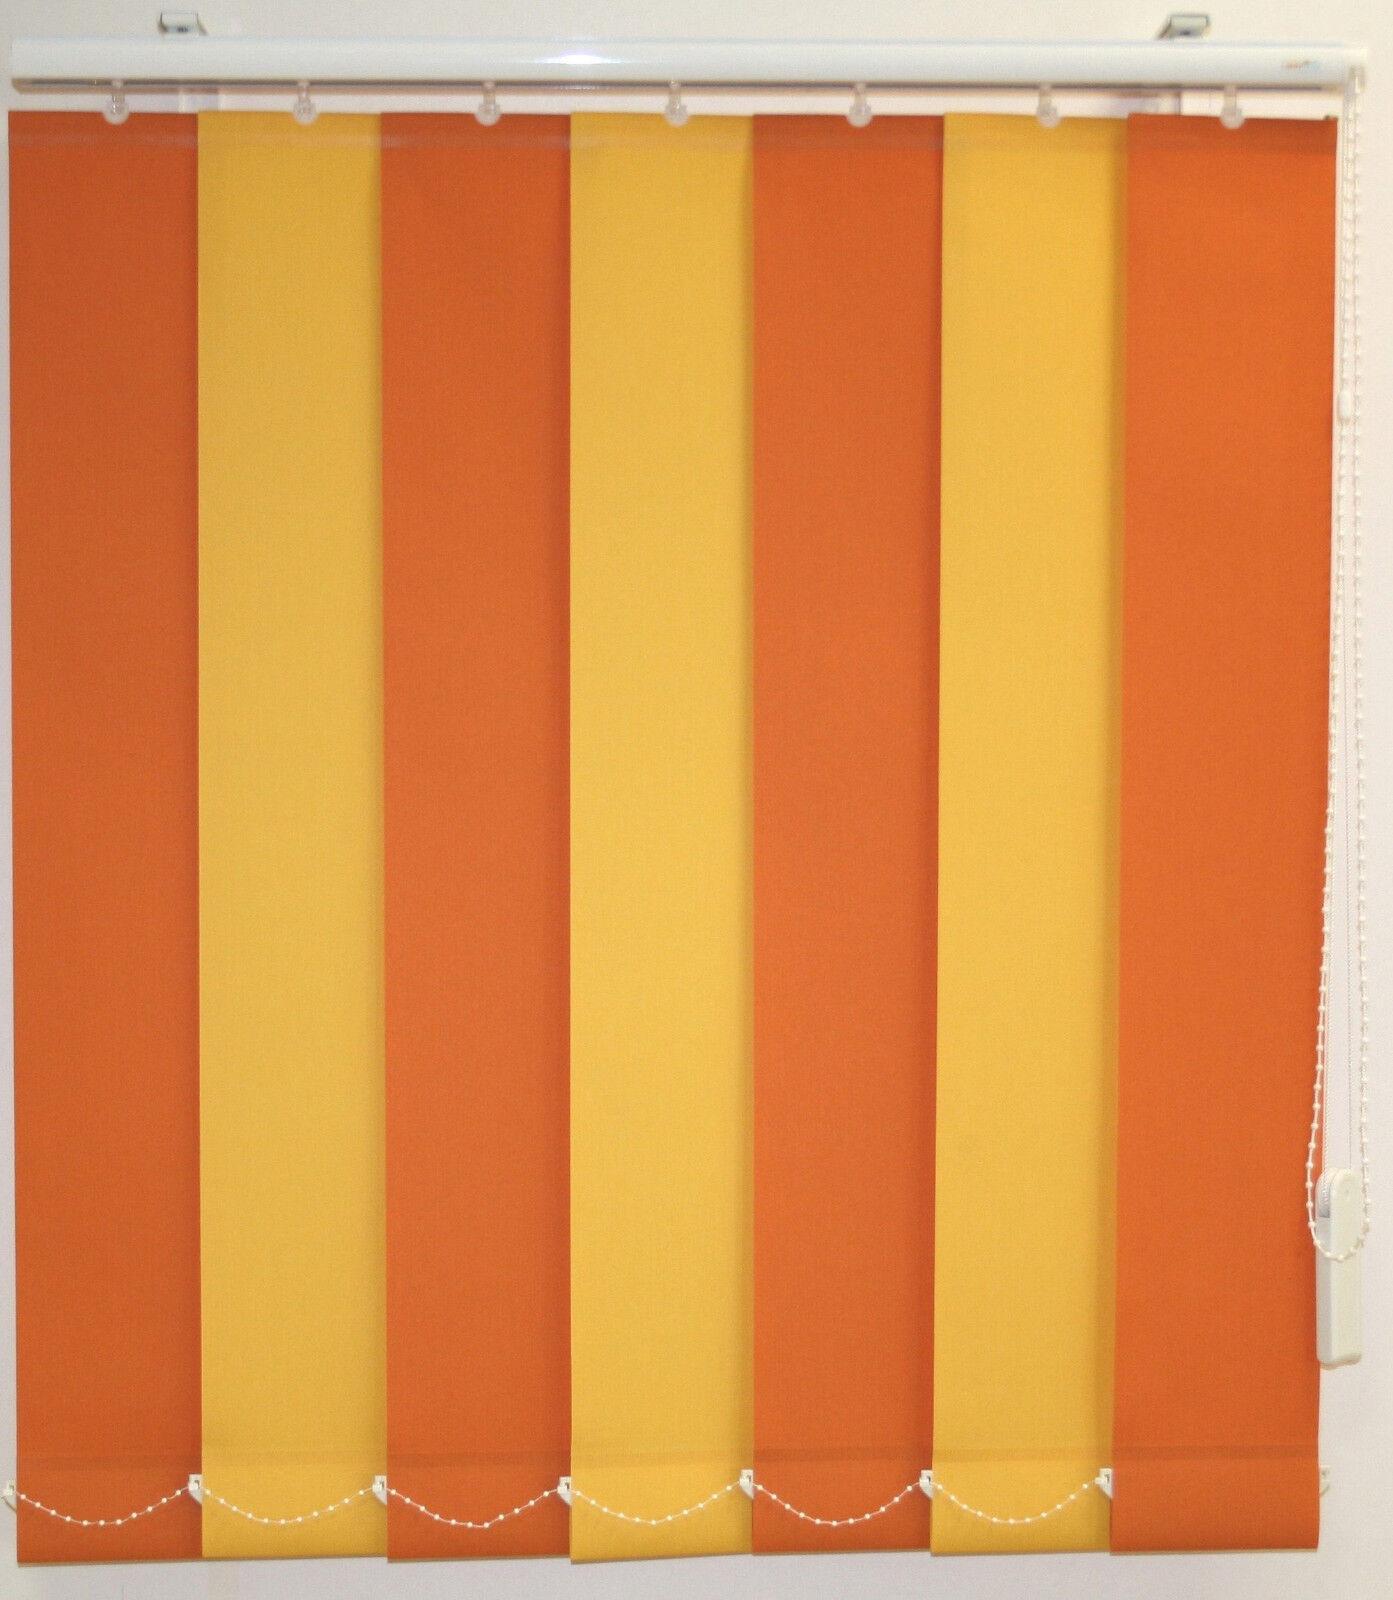 Grünikalanlage Lamellenvorhang Lamellenvorhang Lamellenvorhang gelb-Orange Büro Gardine  B H 170 x 285 cm 3ce06a